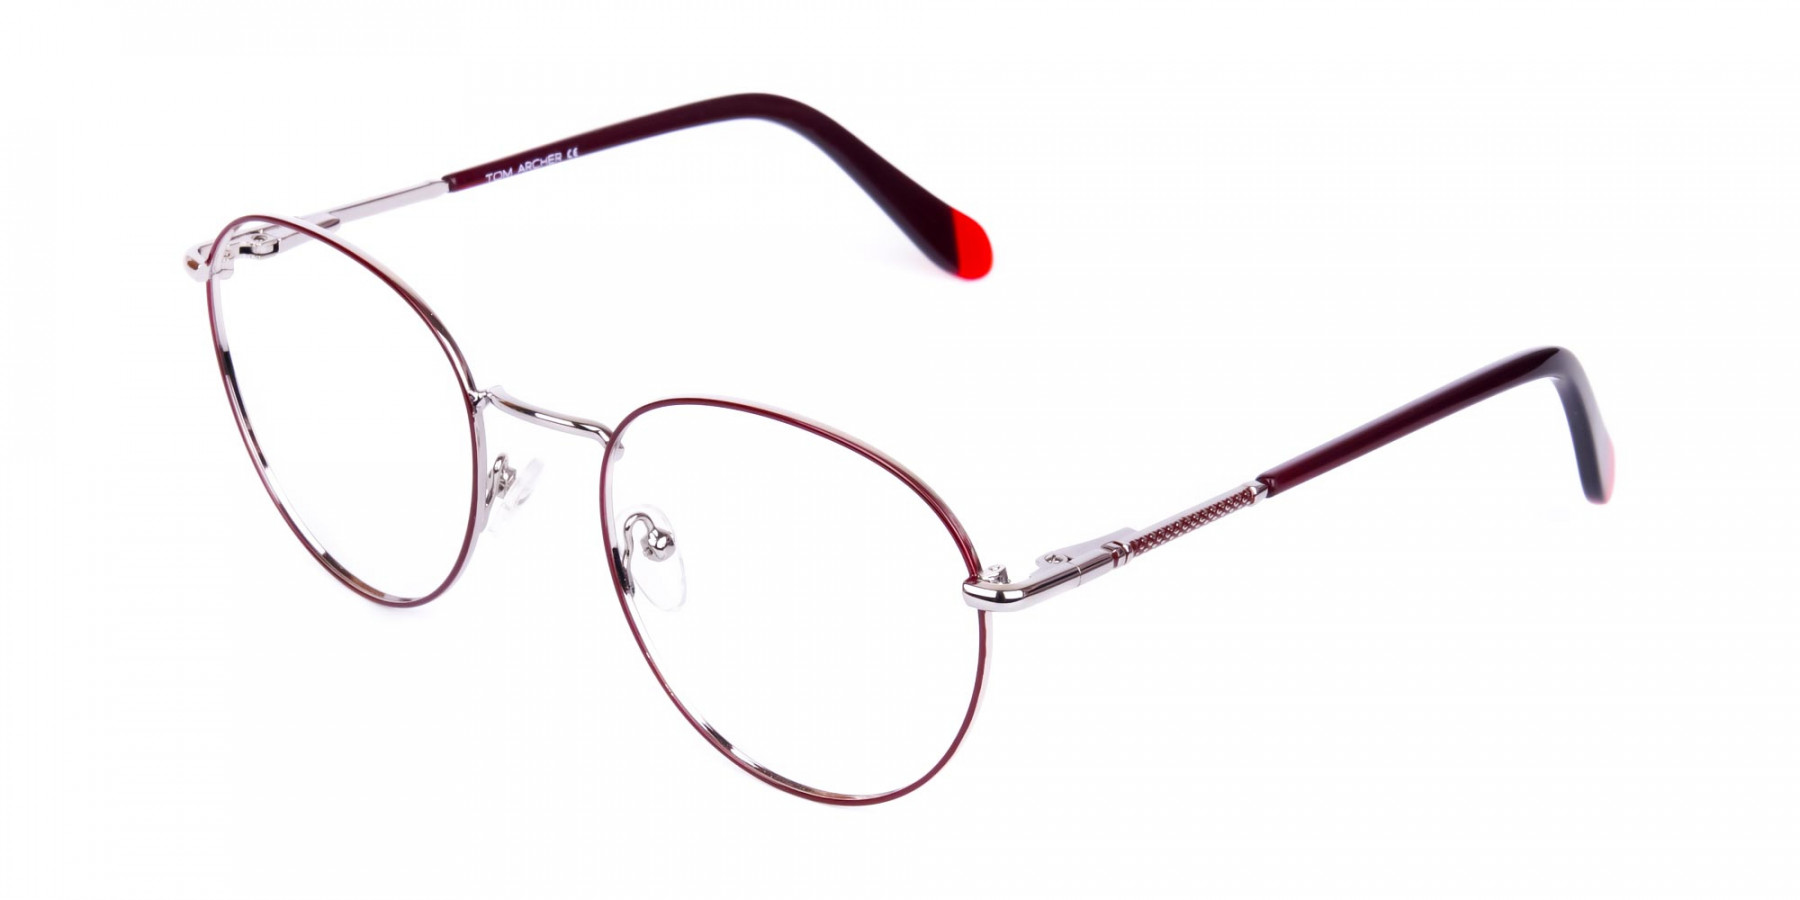 teashade glasses-1